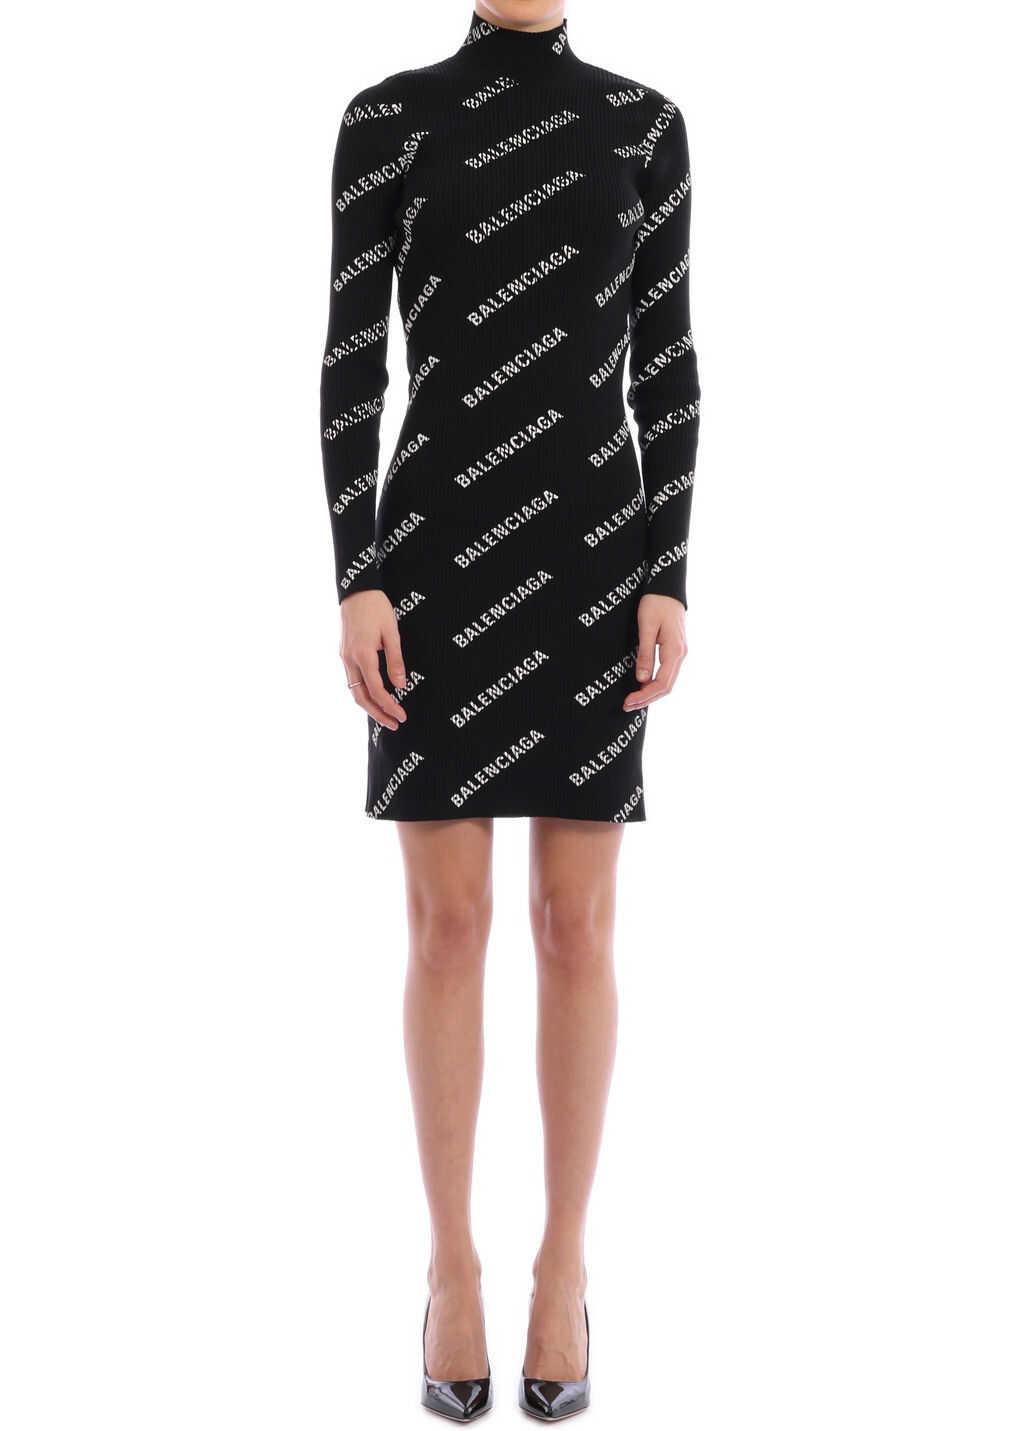 Balenciaga Allover Logo Mini Dress Black/white